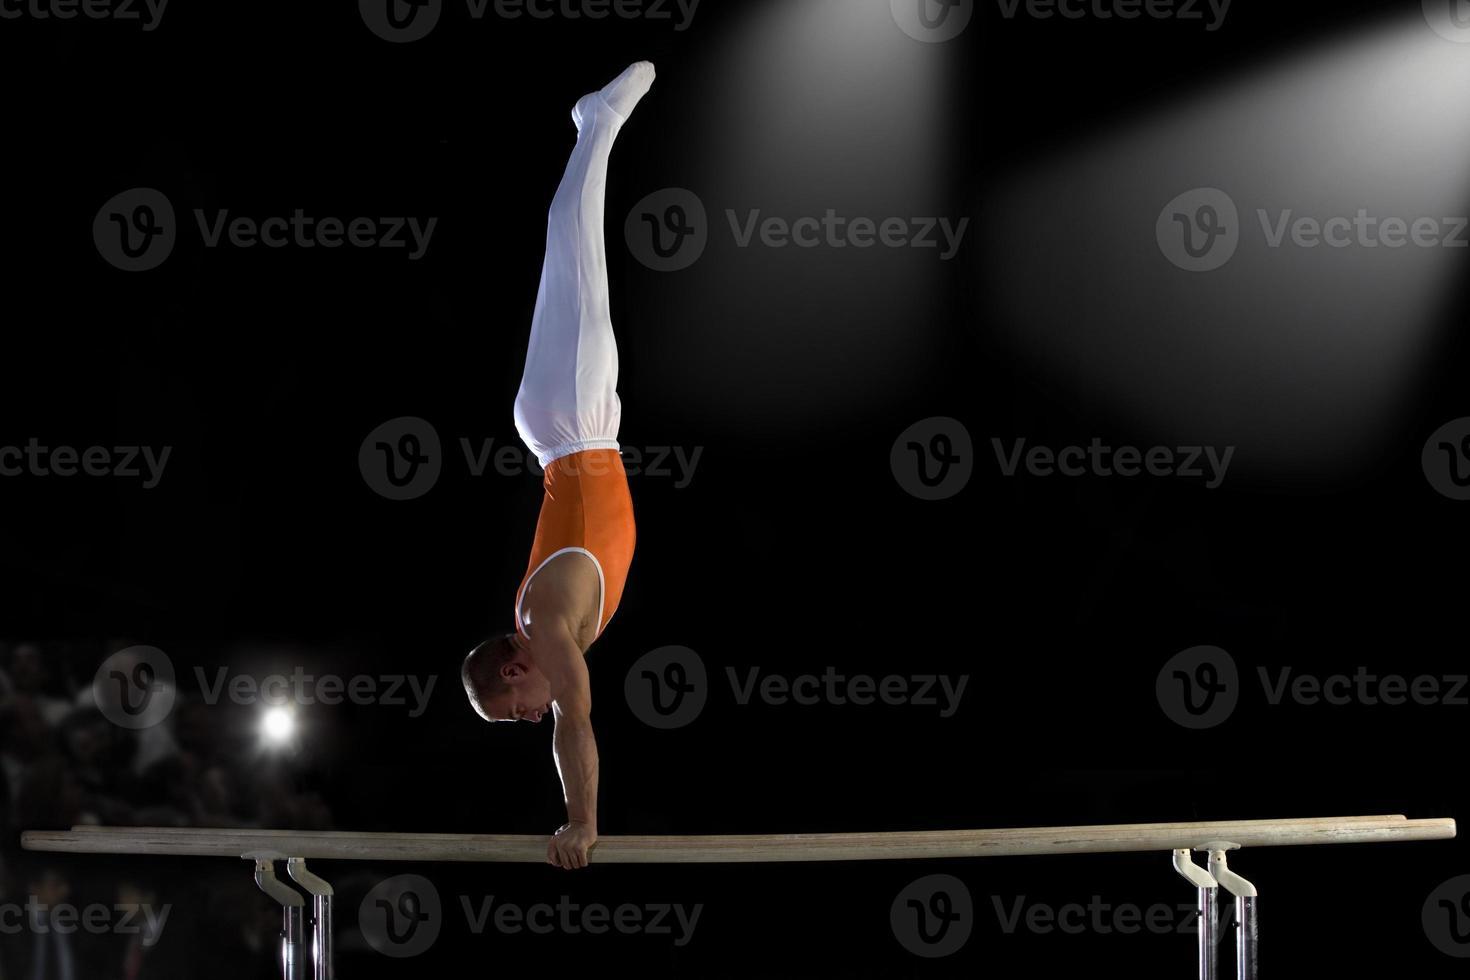 ginnasta maschio eseguendo verticale su barre parallele, vista laterale foto